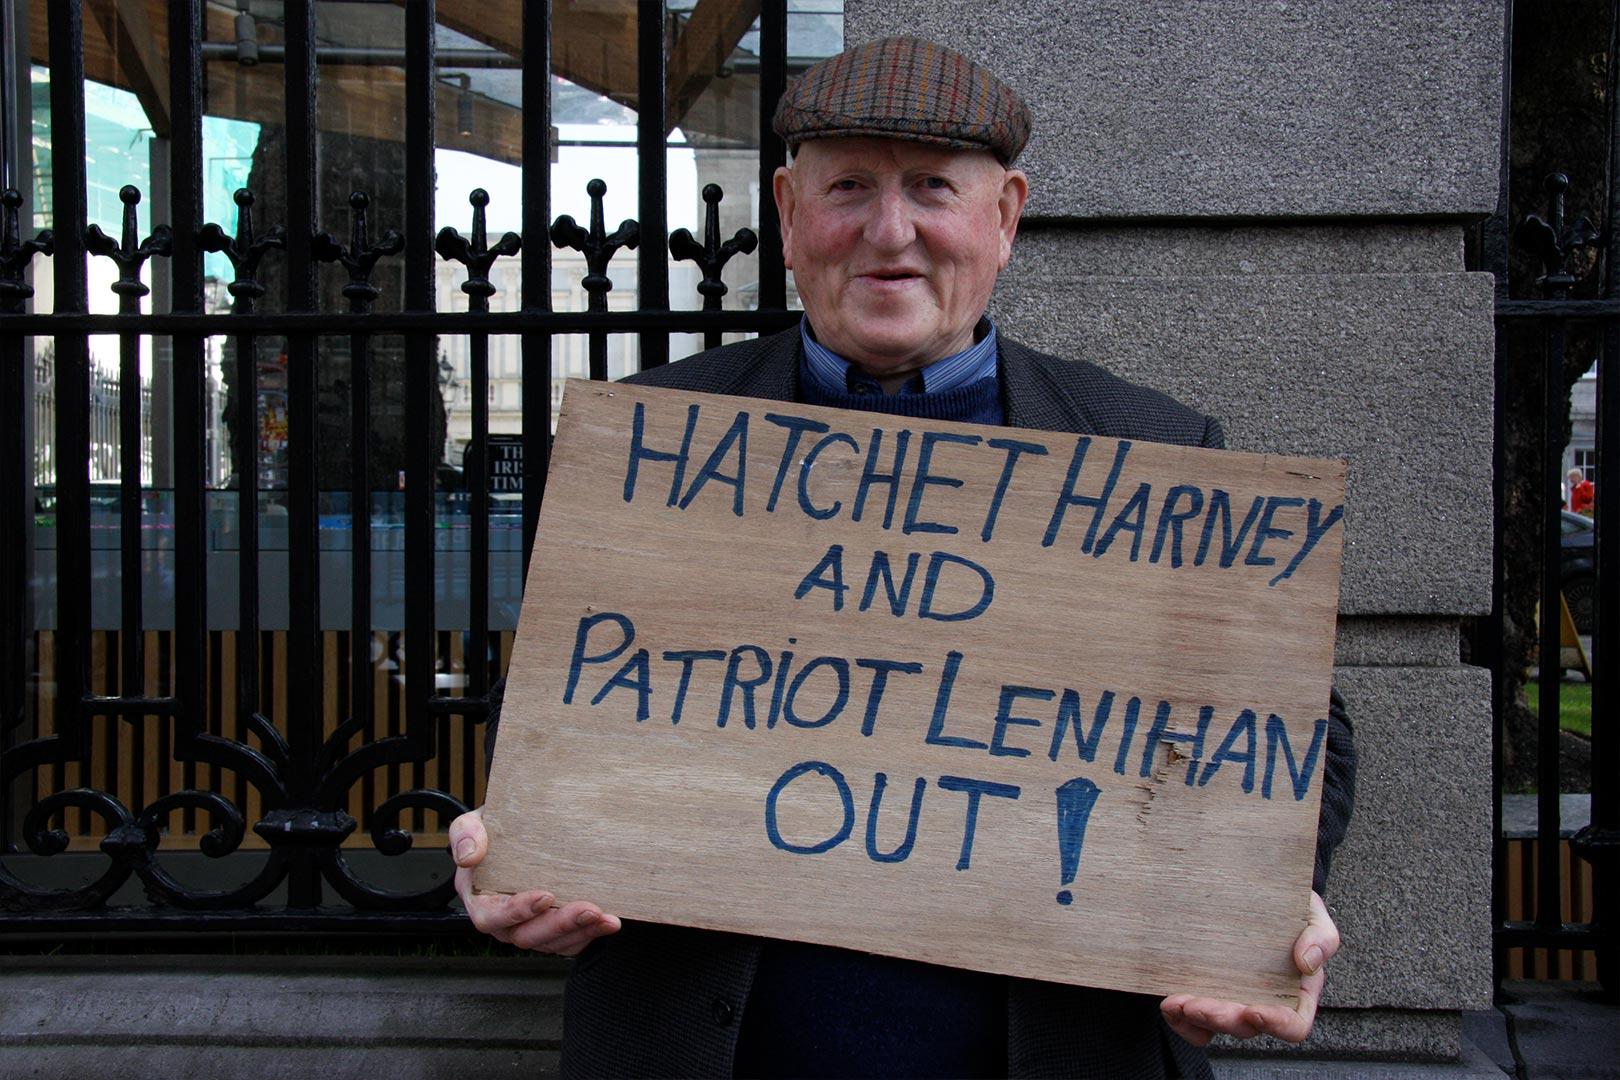 Hatchet Harney and patriot Lenihan Augustine O Donoghue